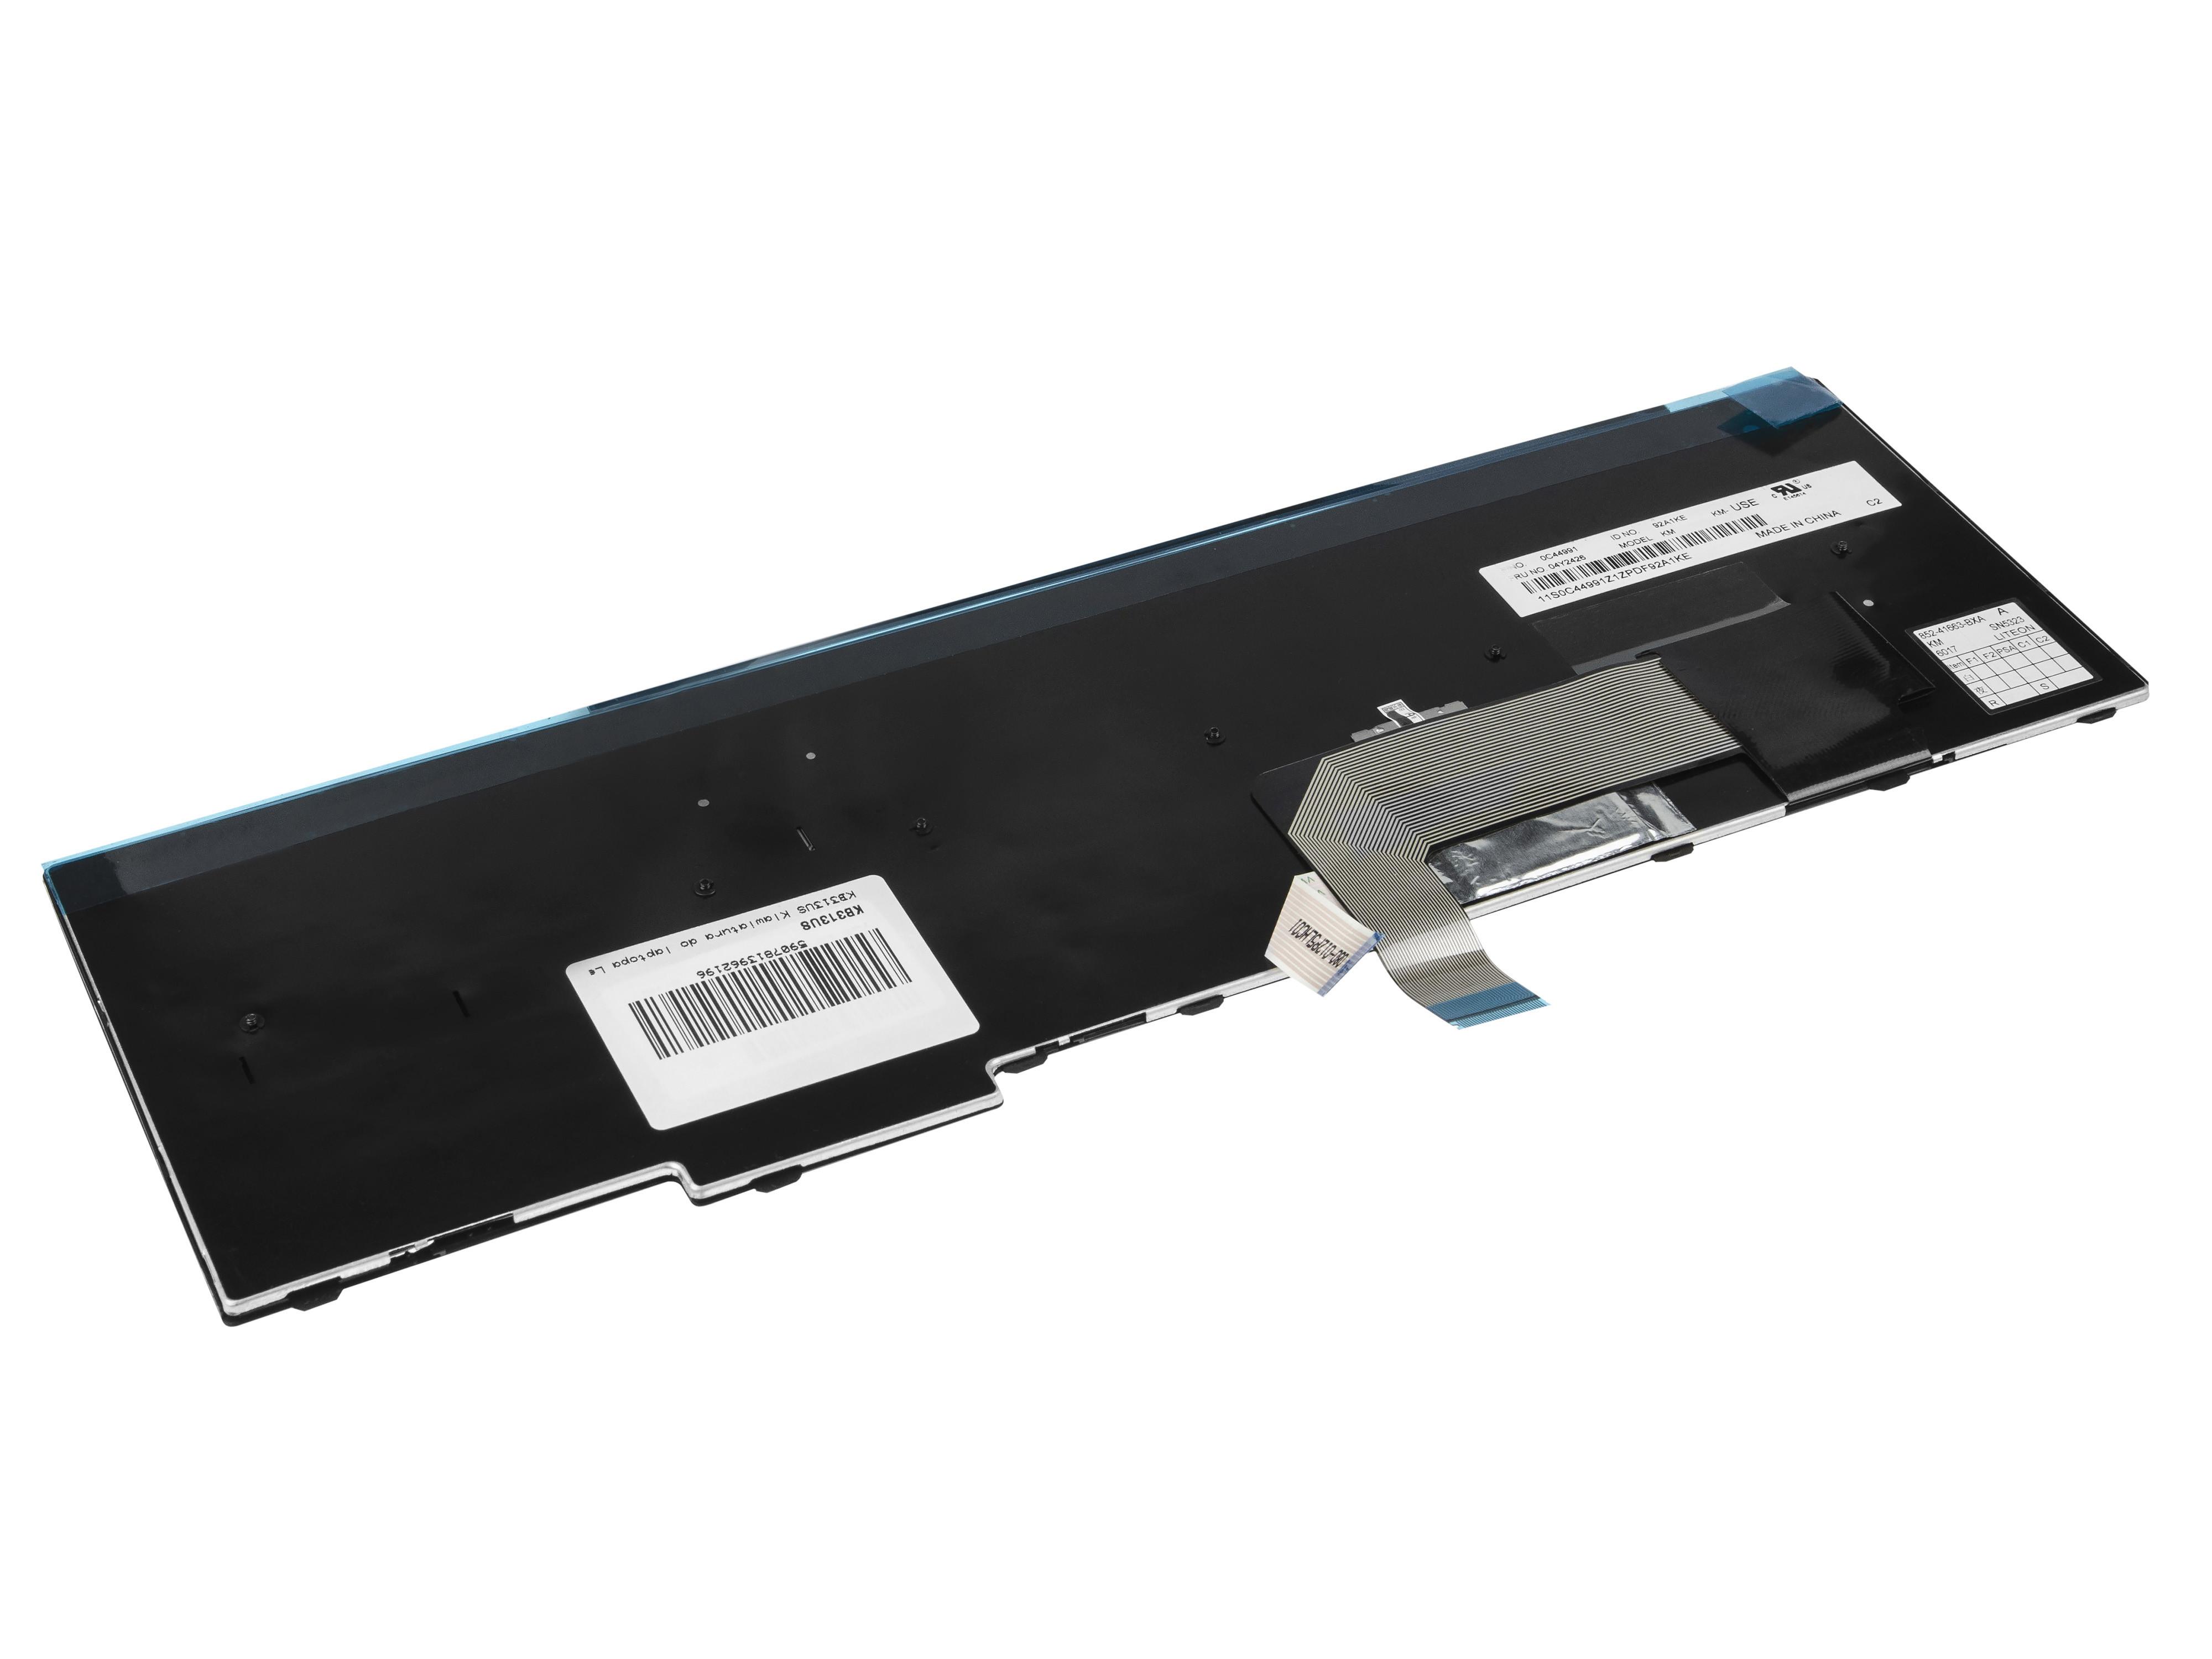 Lenovo ThinkPad E531 E540 E545 L540 Keyboard